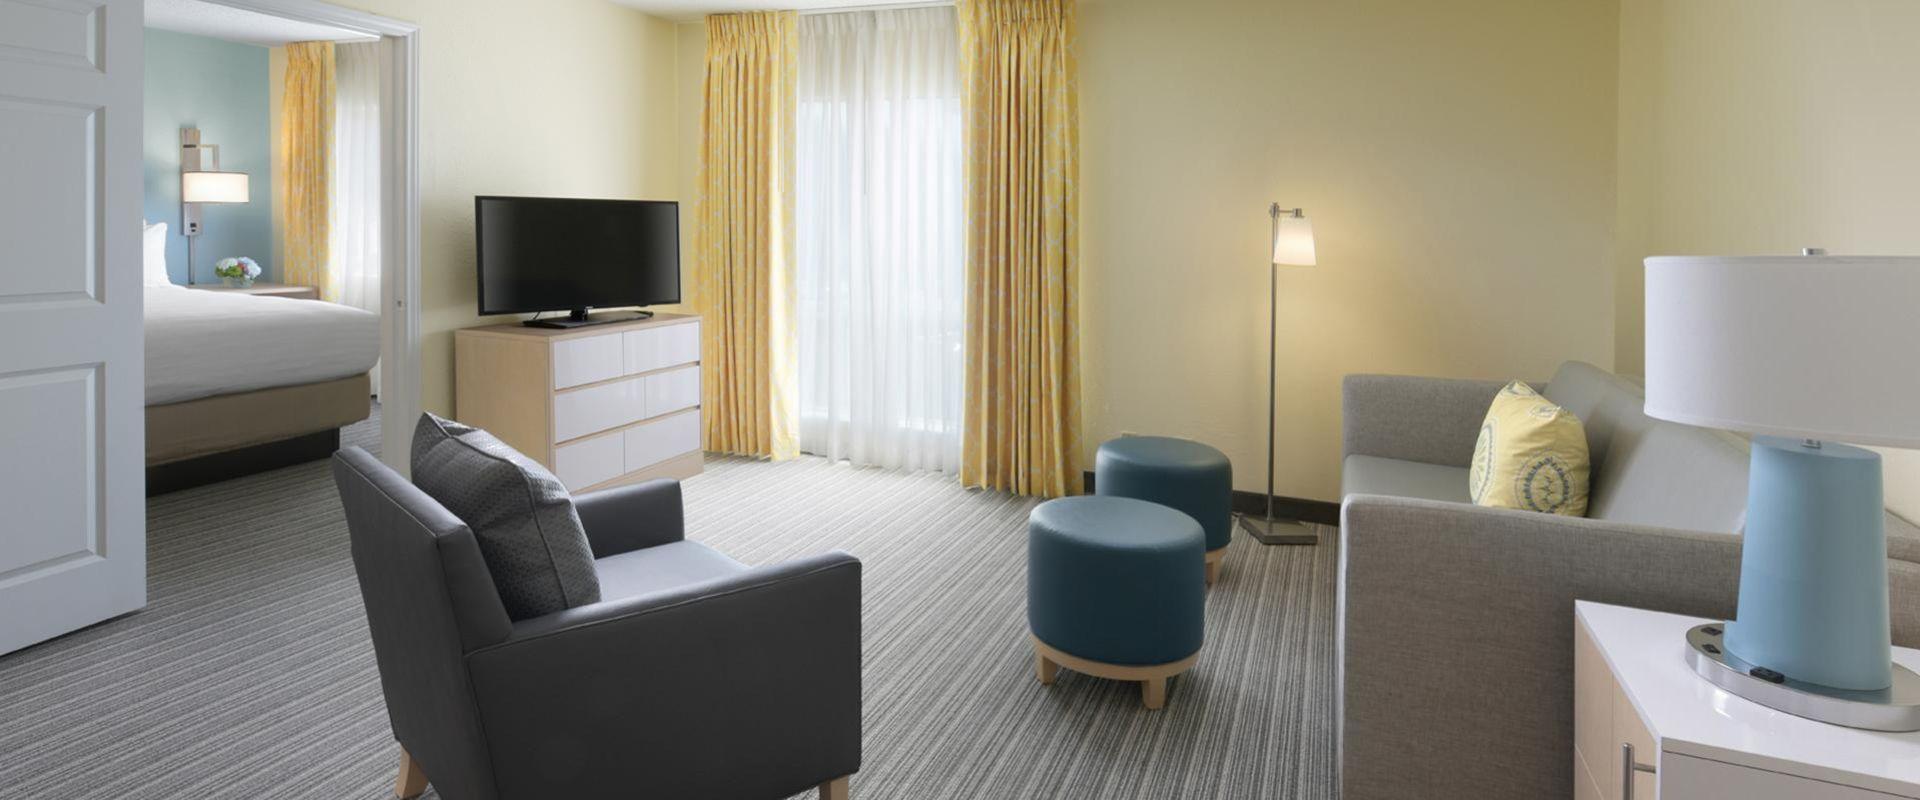 One Bedroom Suite Living Space